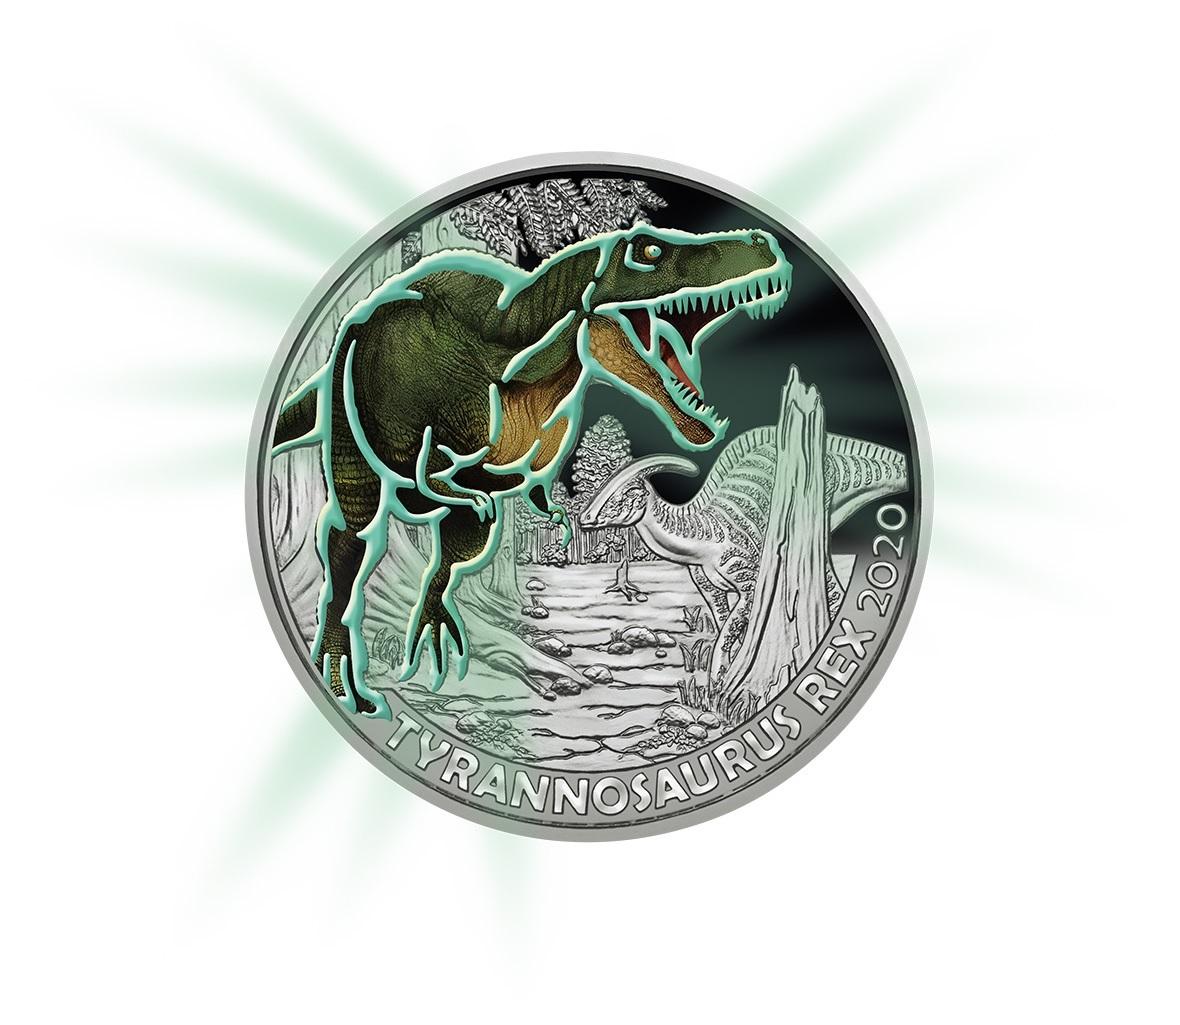 (EUR01.ComBU&BE.2020.300.24597) 3 euro Austria 2020 - Tyrannosaurus Rex Reverse (glow-in-the-dark) (zoom)